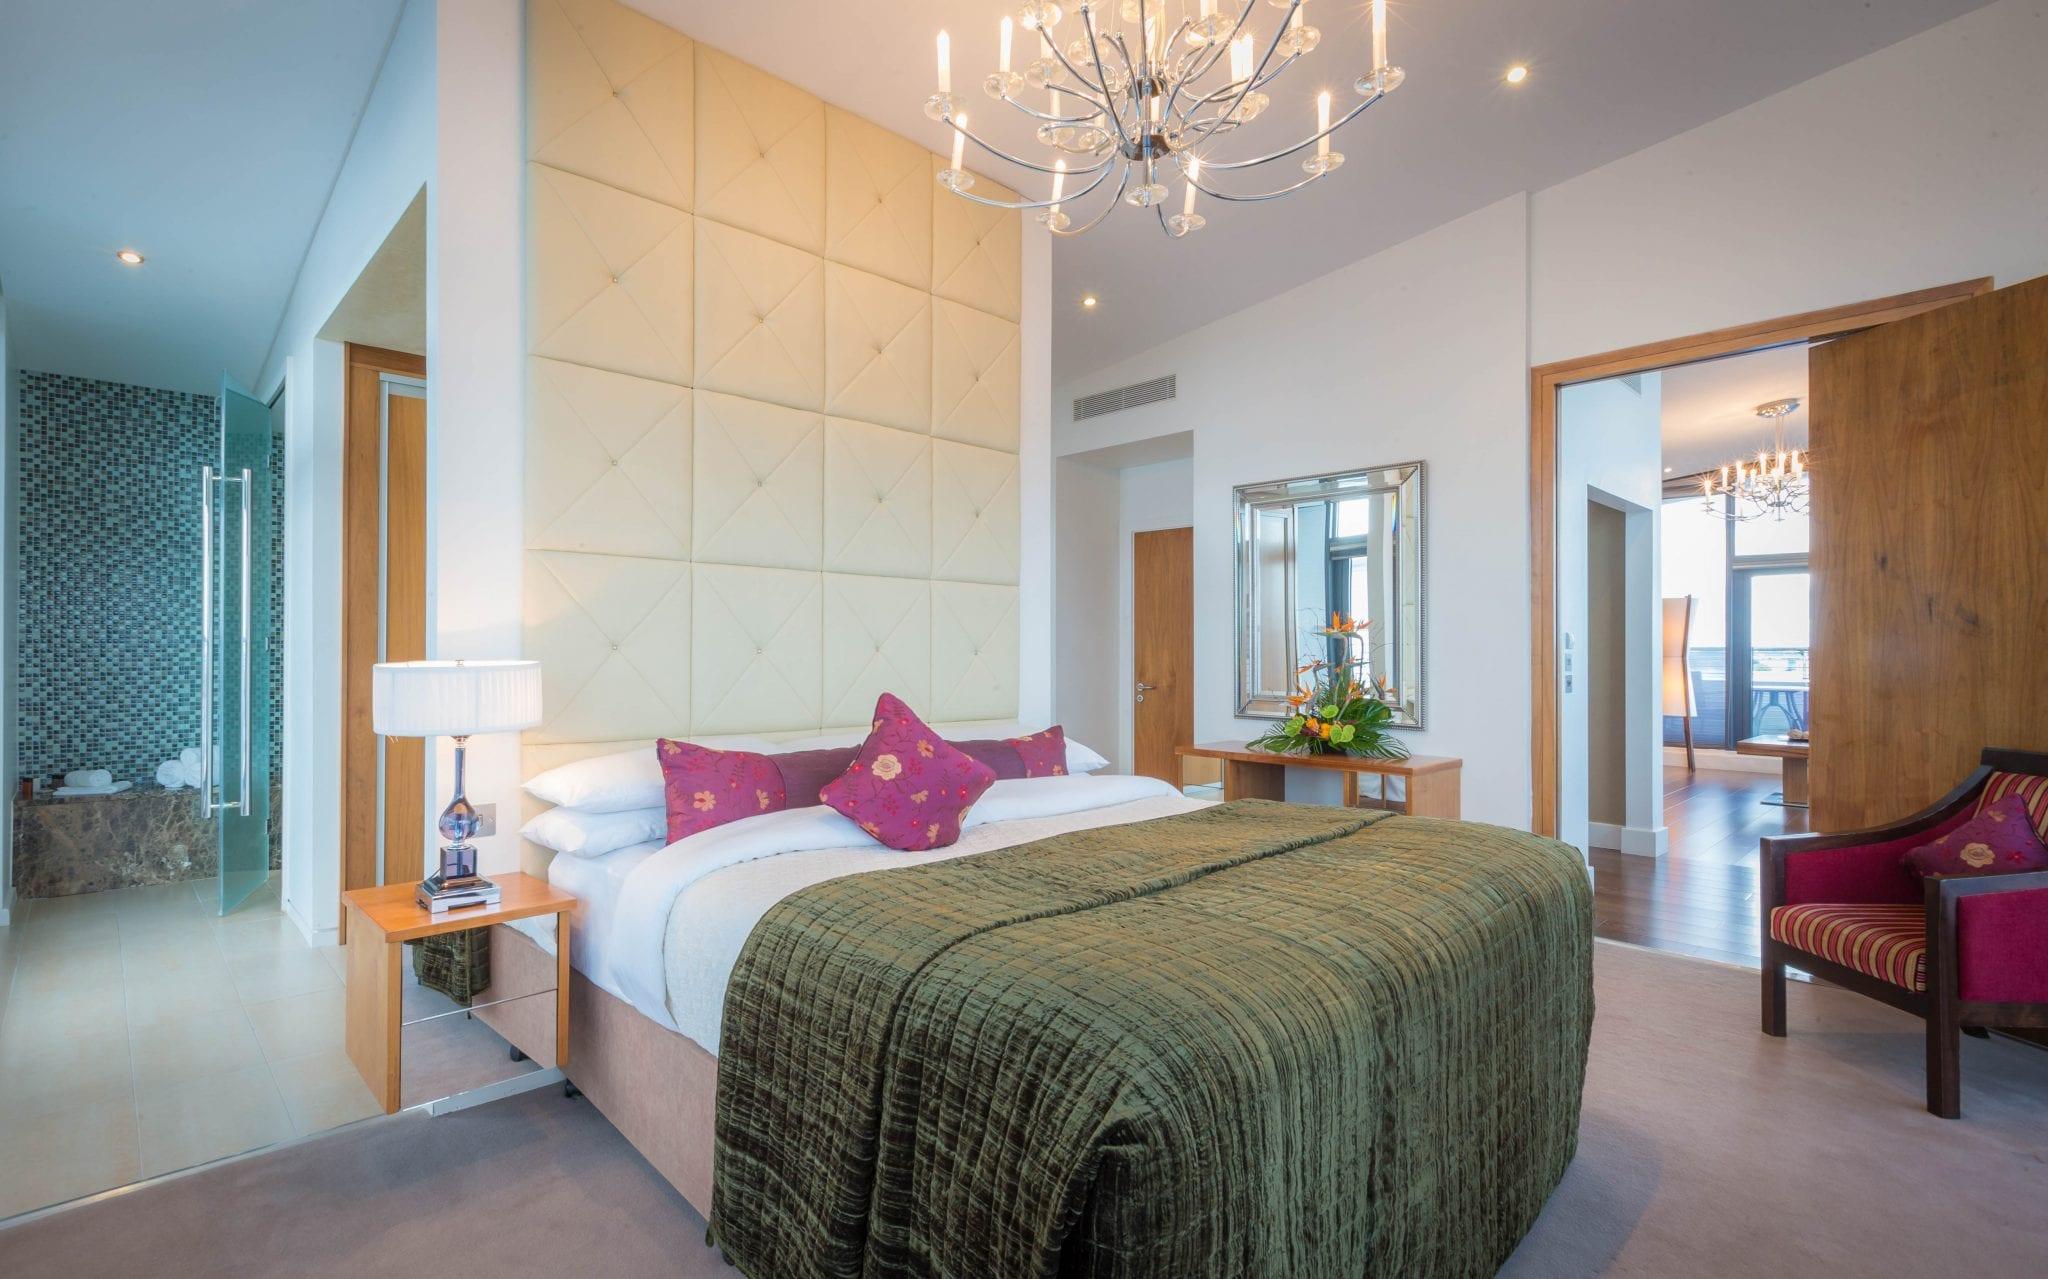 presidential suite clayton hotel galway